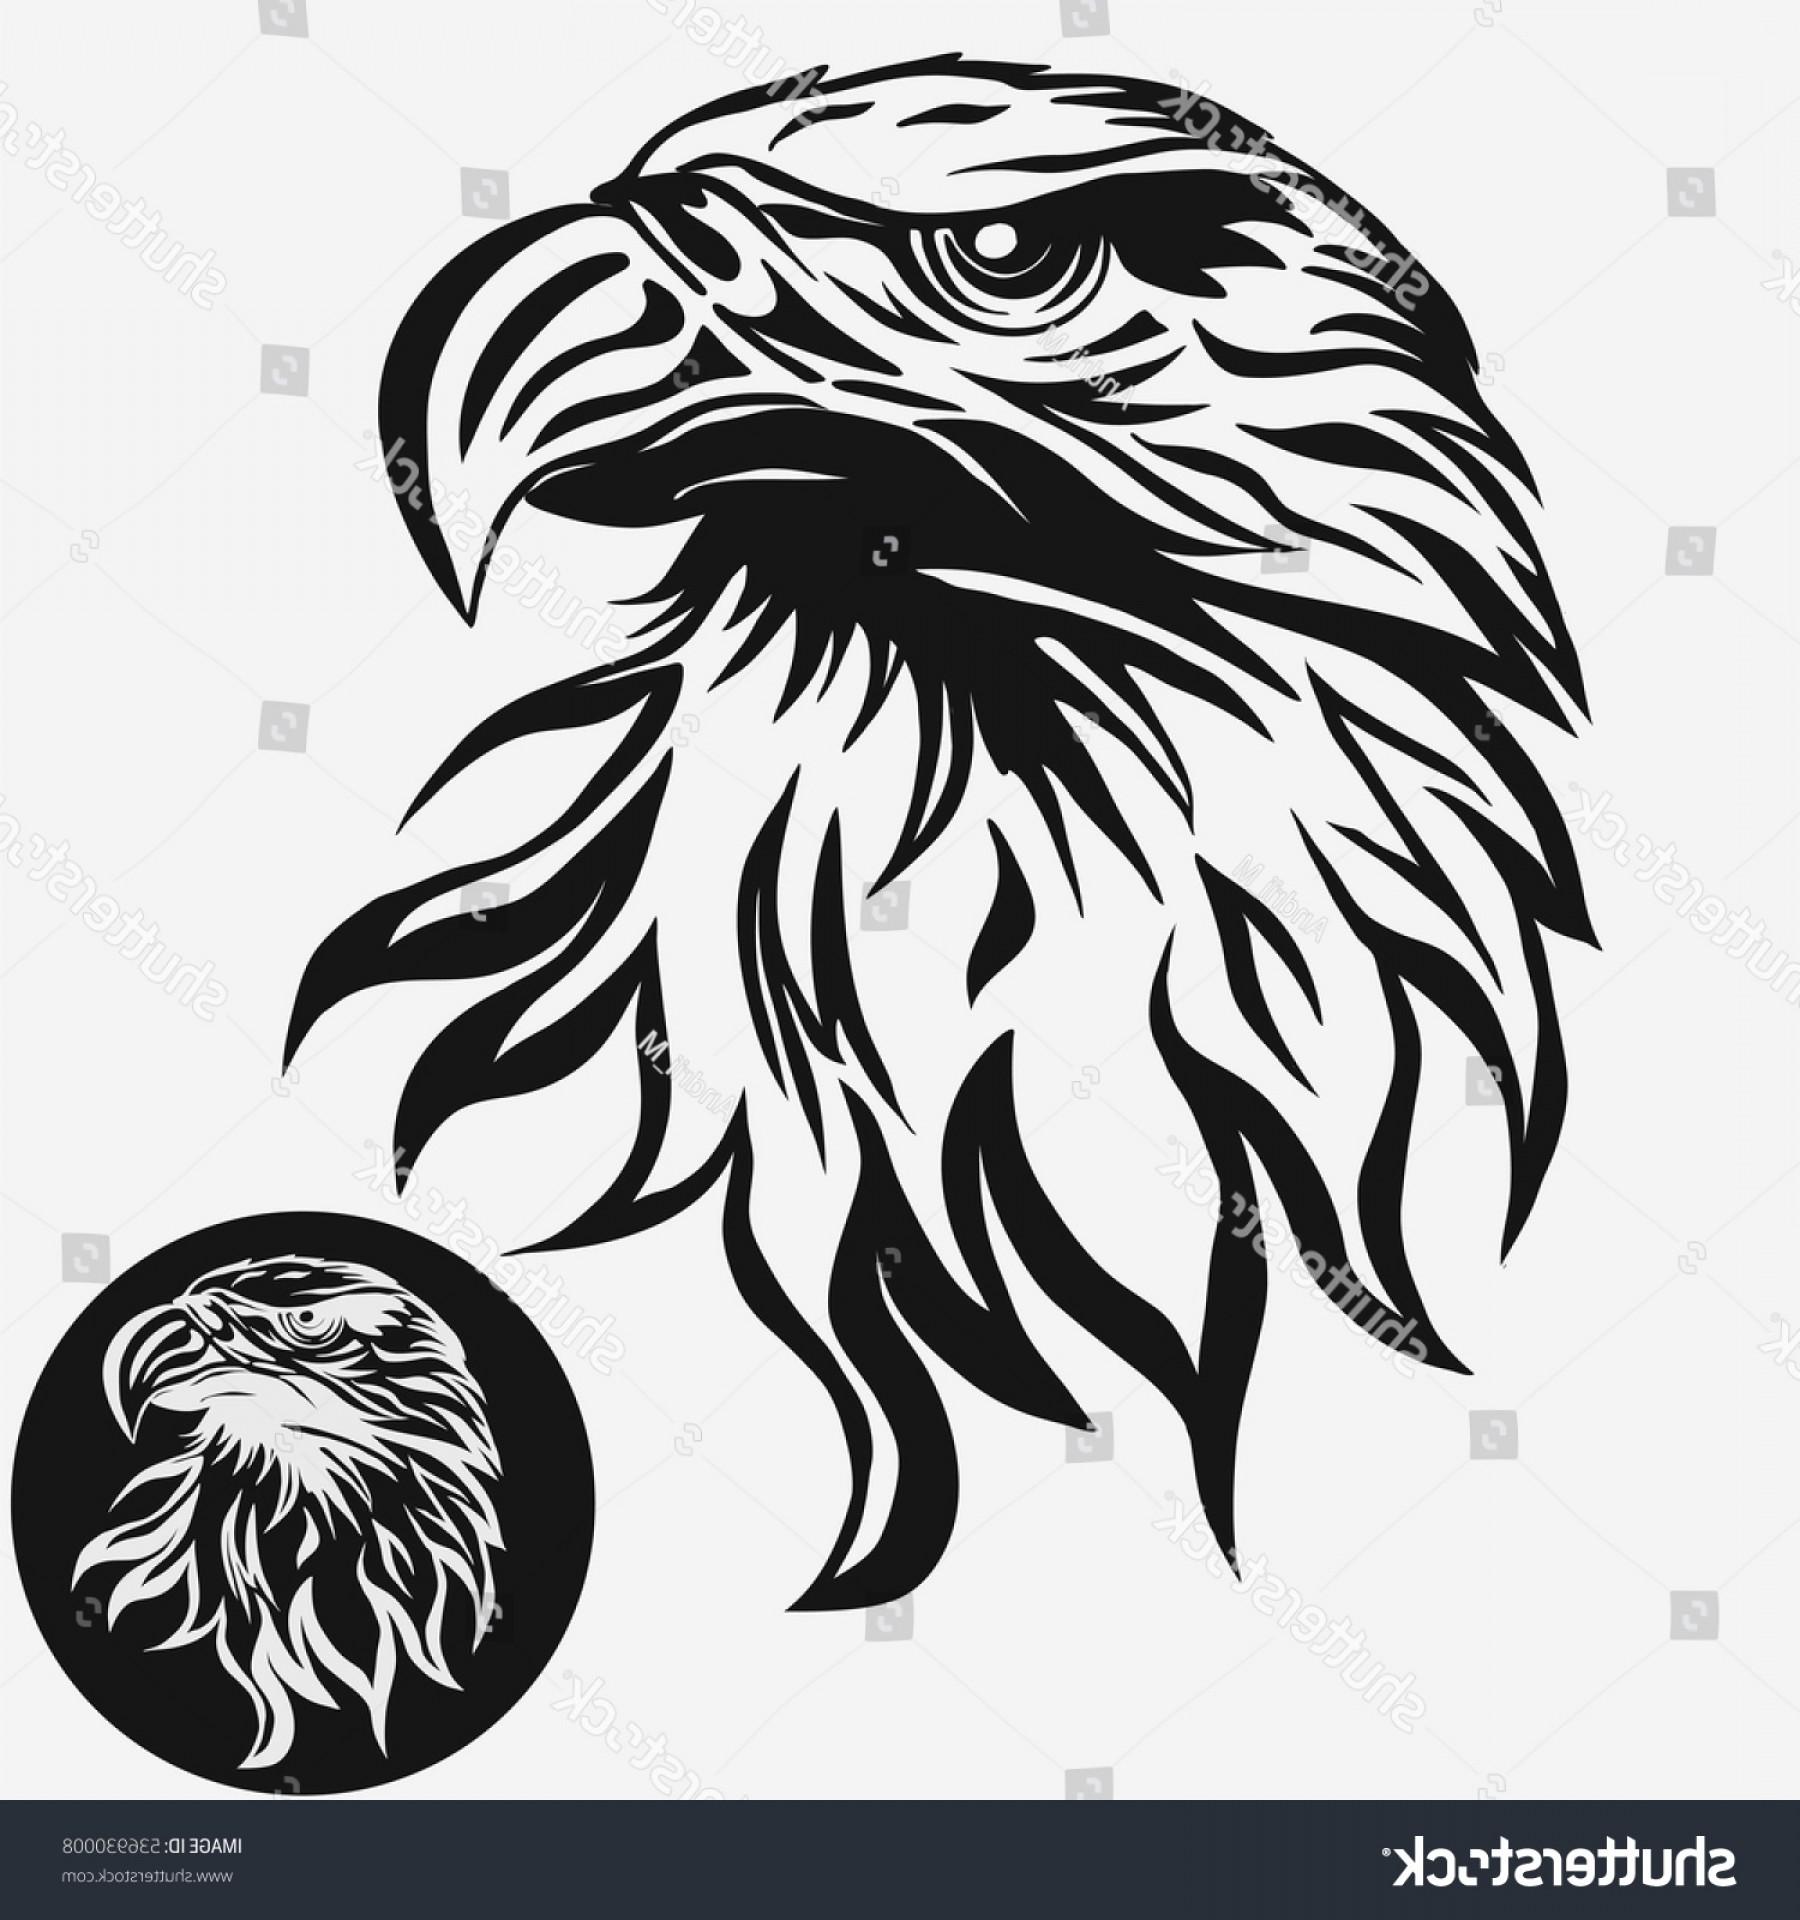 Hawk mascot clipart jpg black and white library Eagle Head Logo Template Hawk Mascot   SOIDERGI jpg black and white library